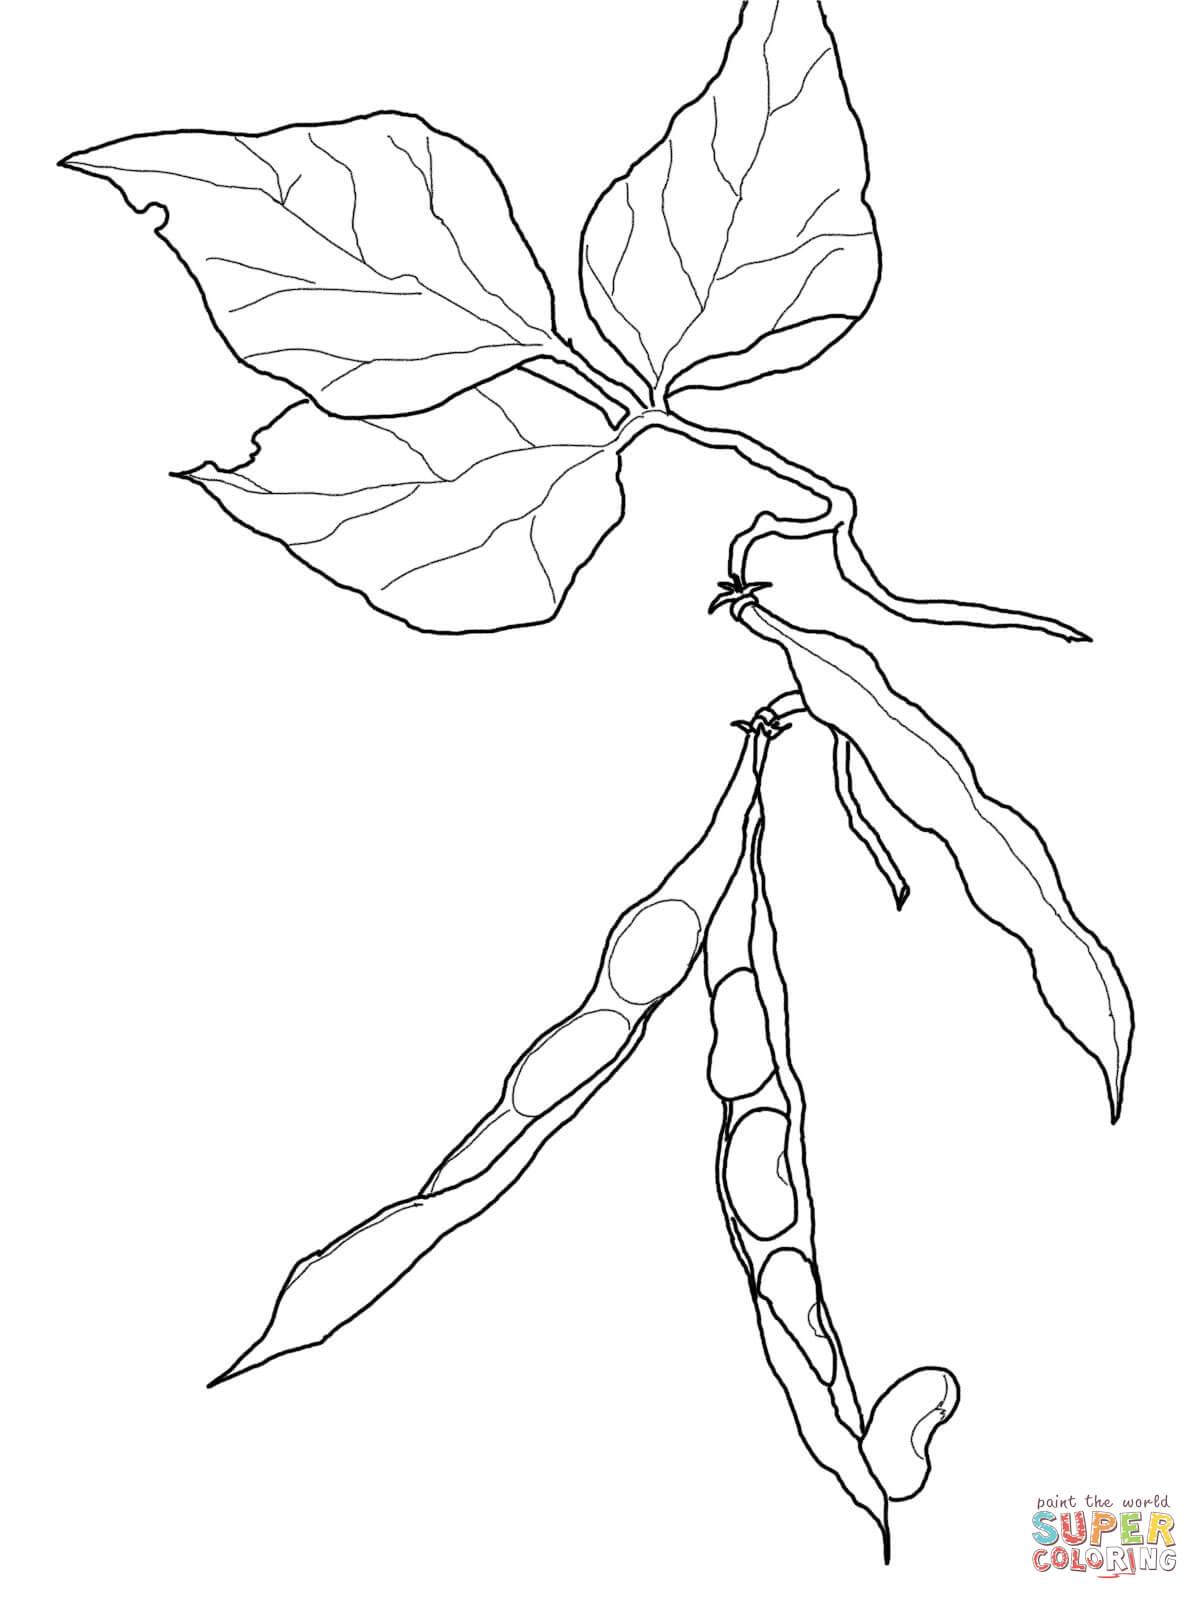 Beans coloring #5, Download drawings